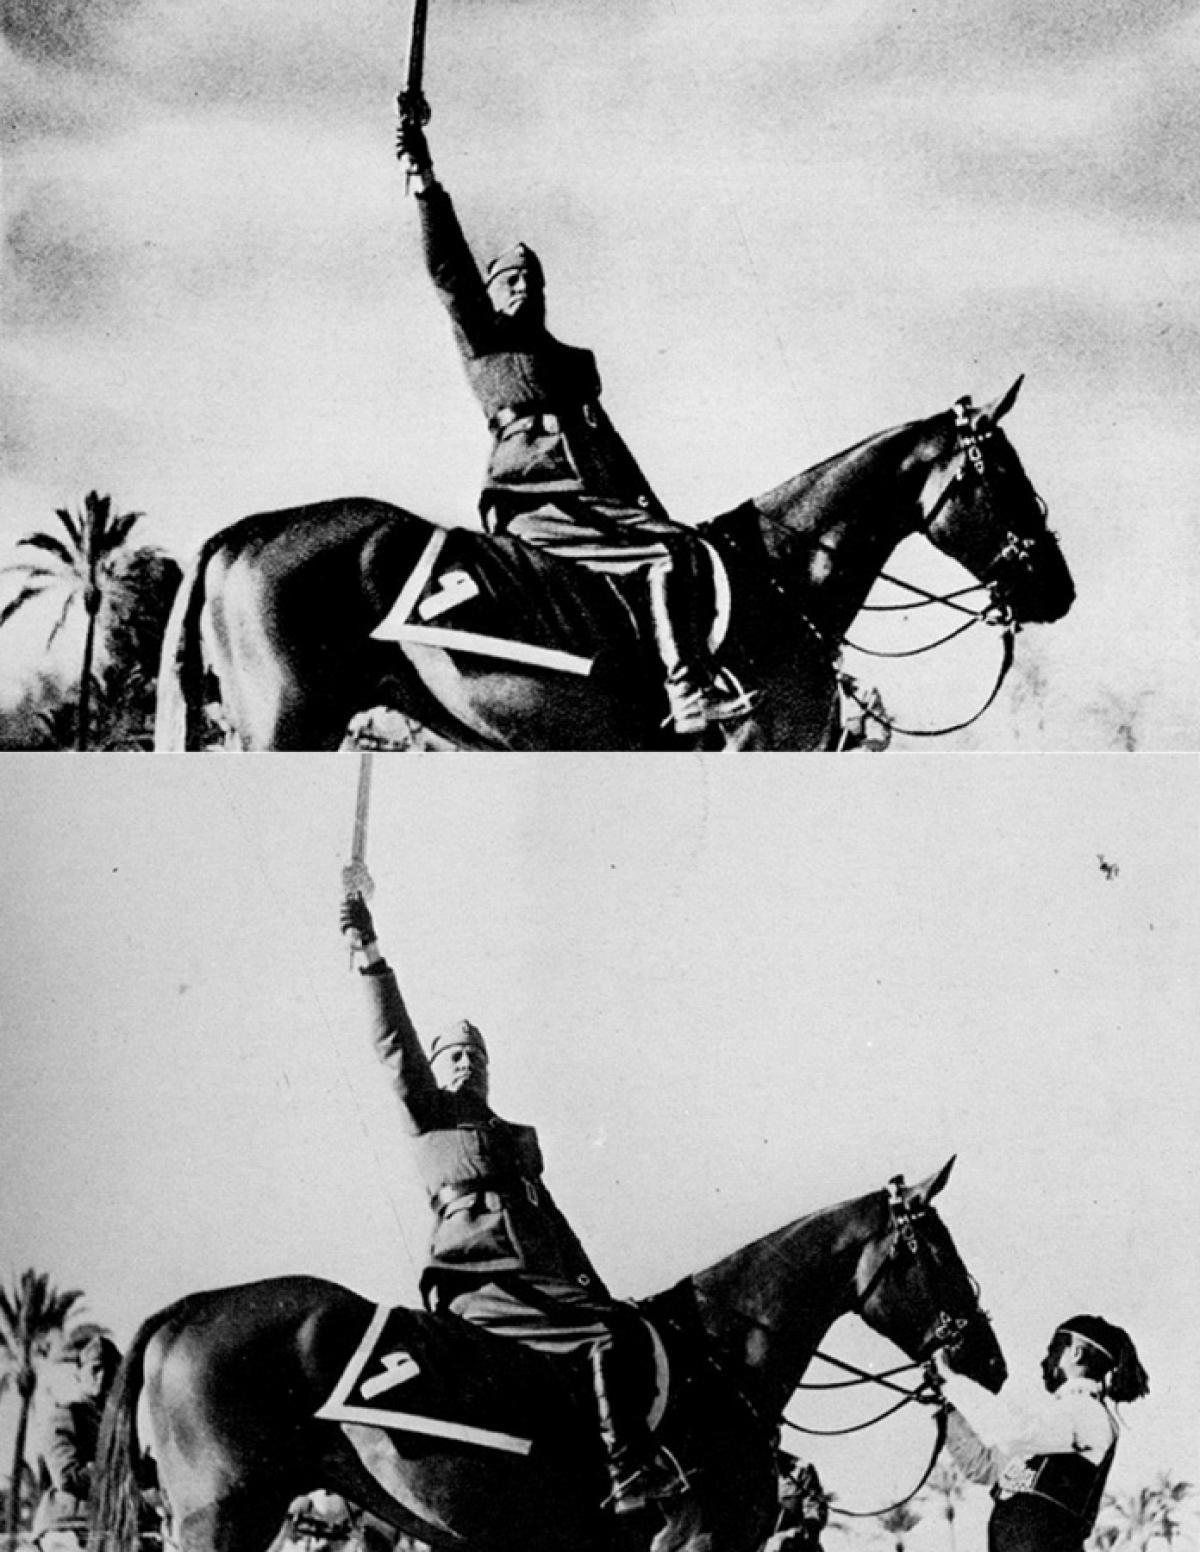 photos-historiques-benito-mussolini